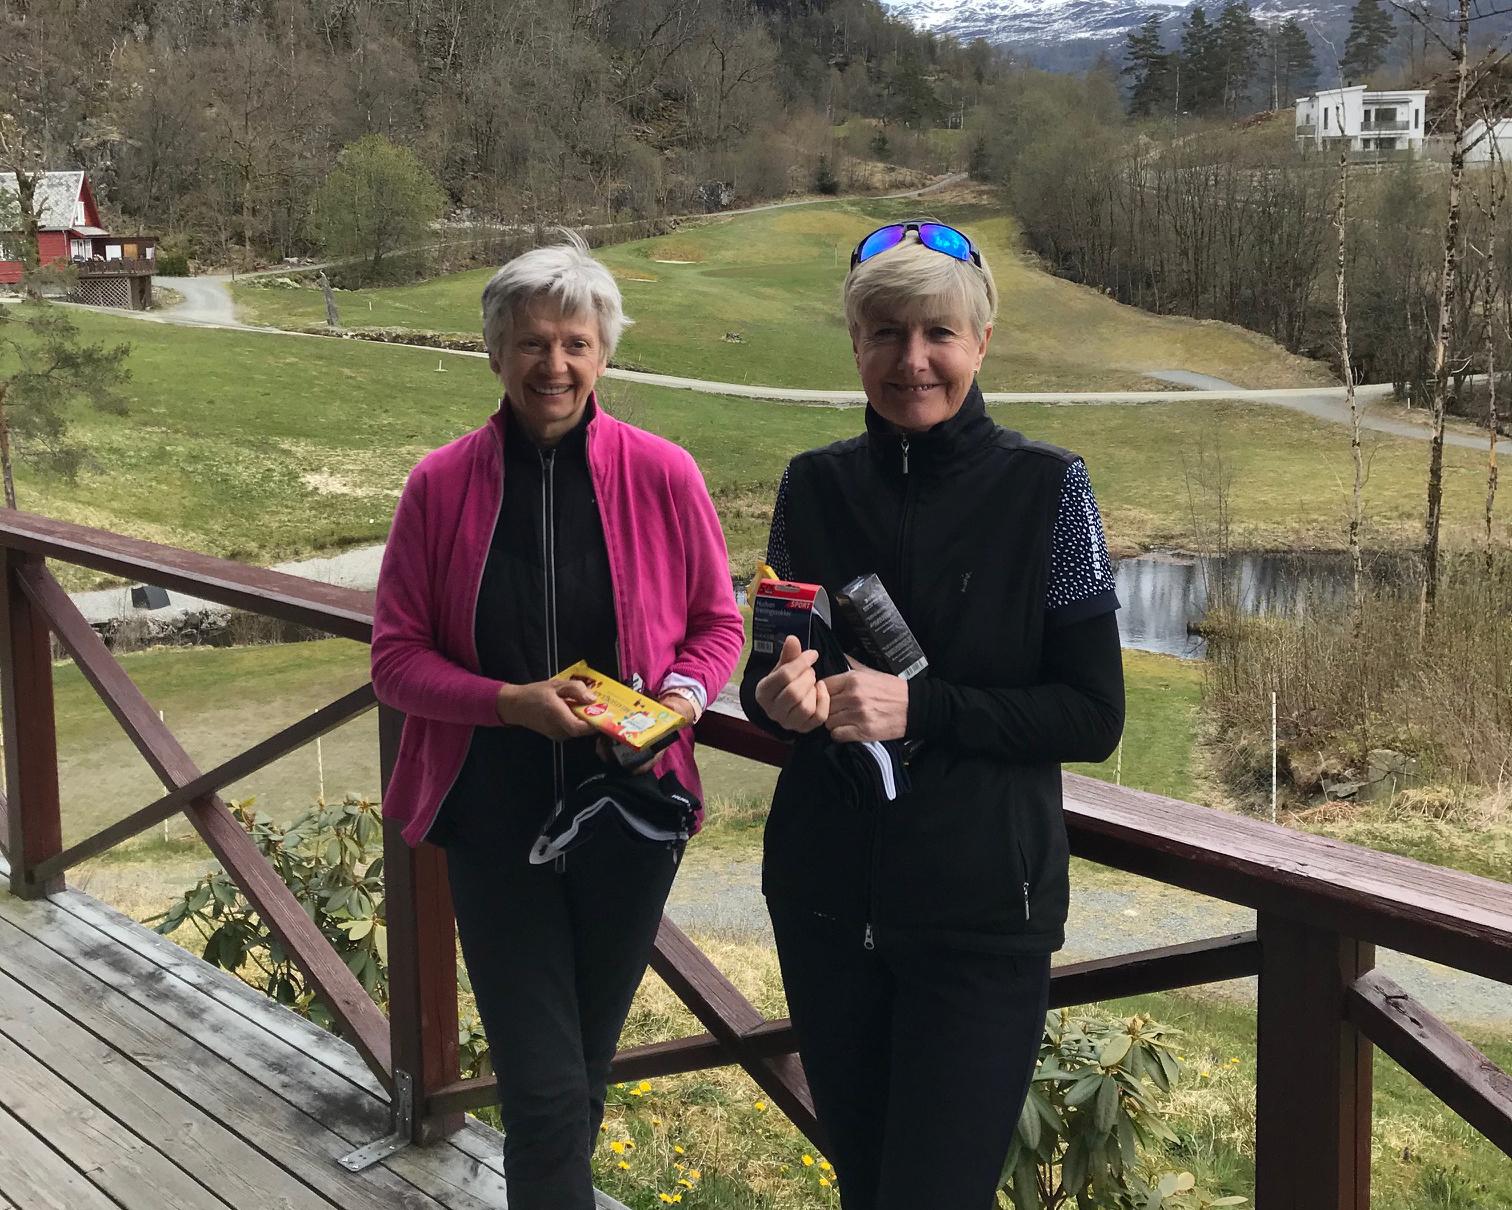 Sigrid Isberg Klyve og Bente Rafdal vant 1. mai parturneringen.